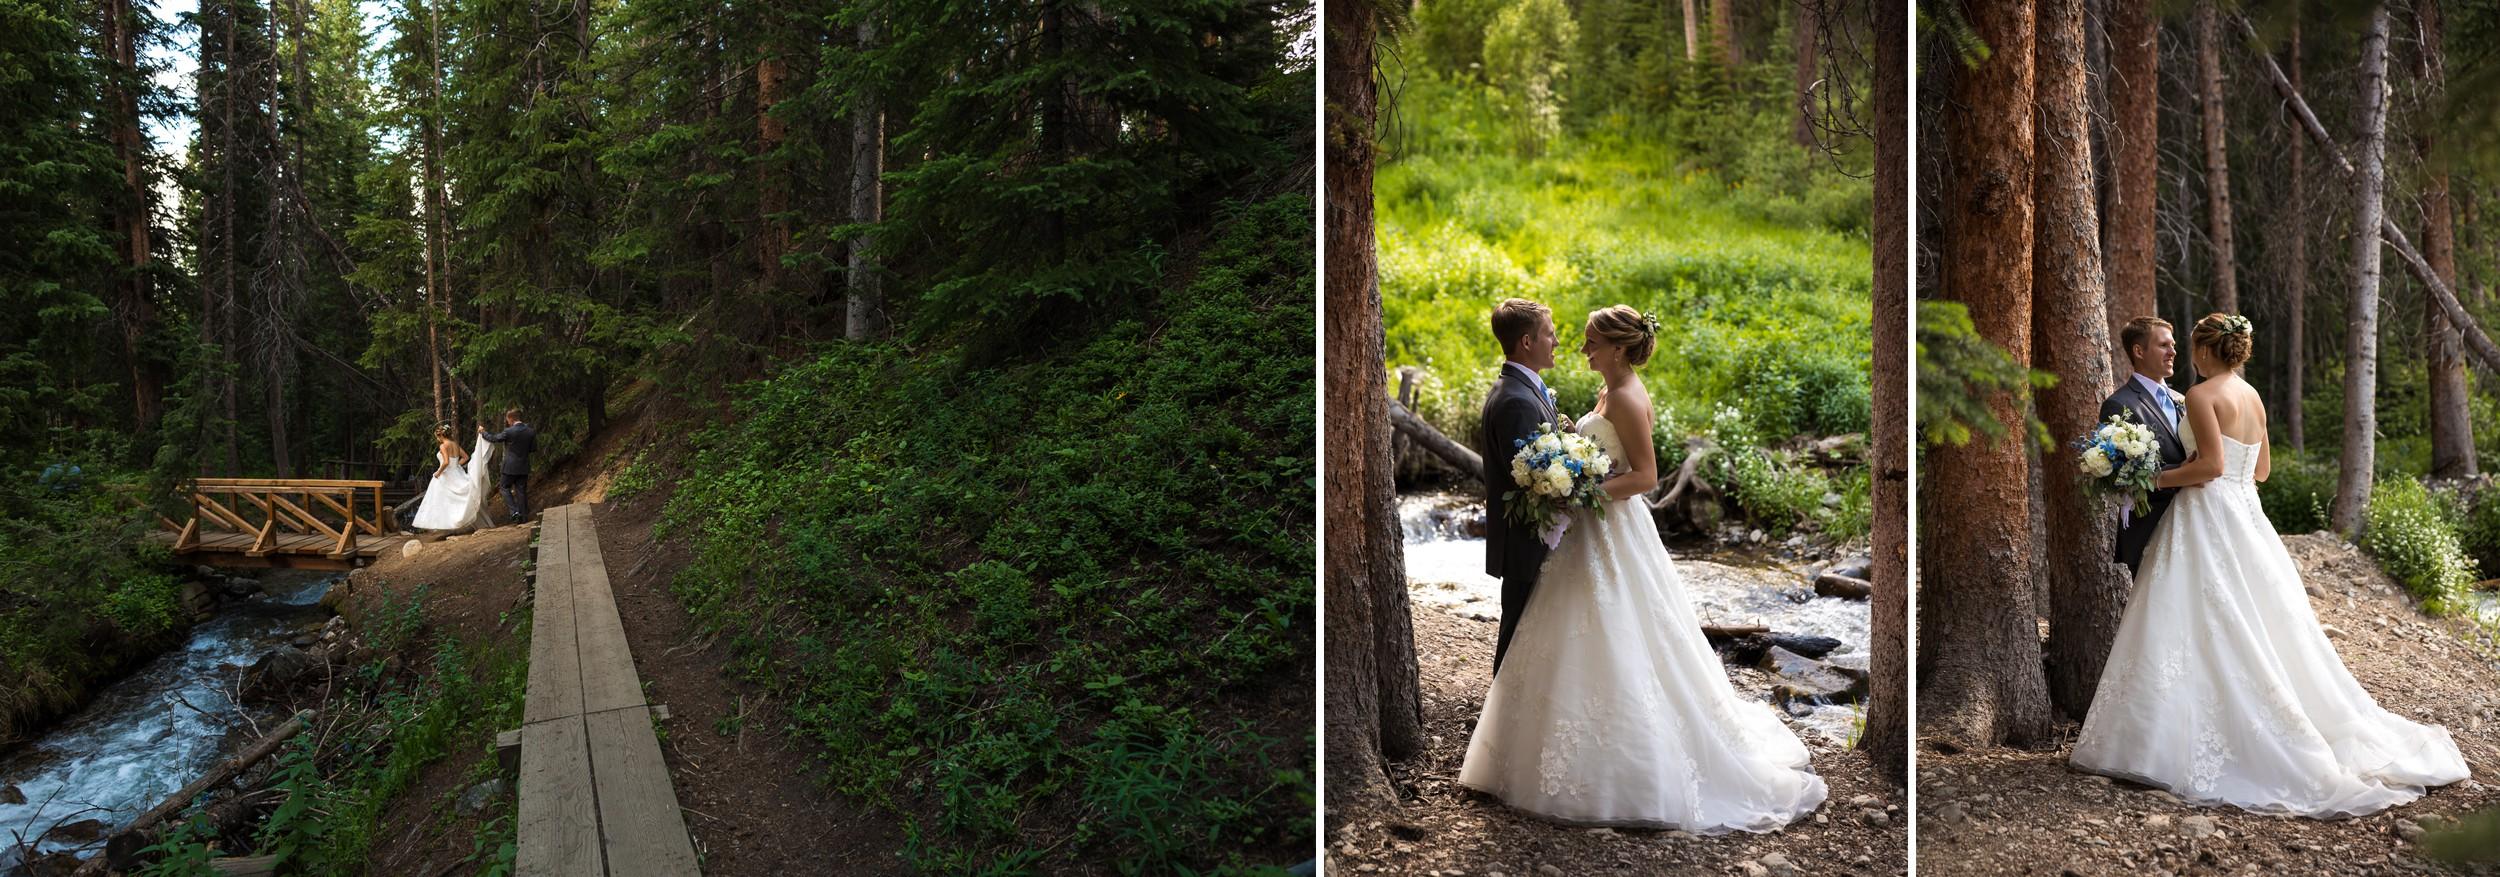 Breckenridge_Wedding_Photographer_Kristopher_Lindsay_ 15.jpg